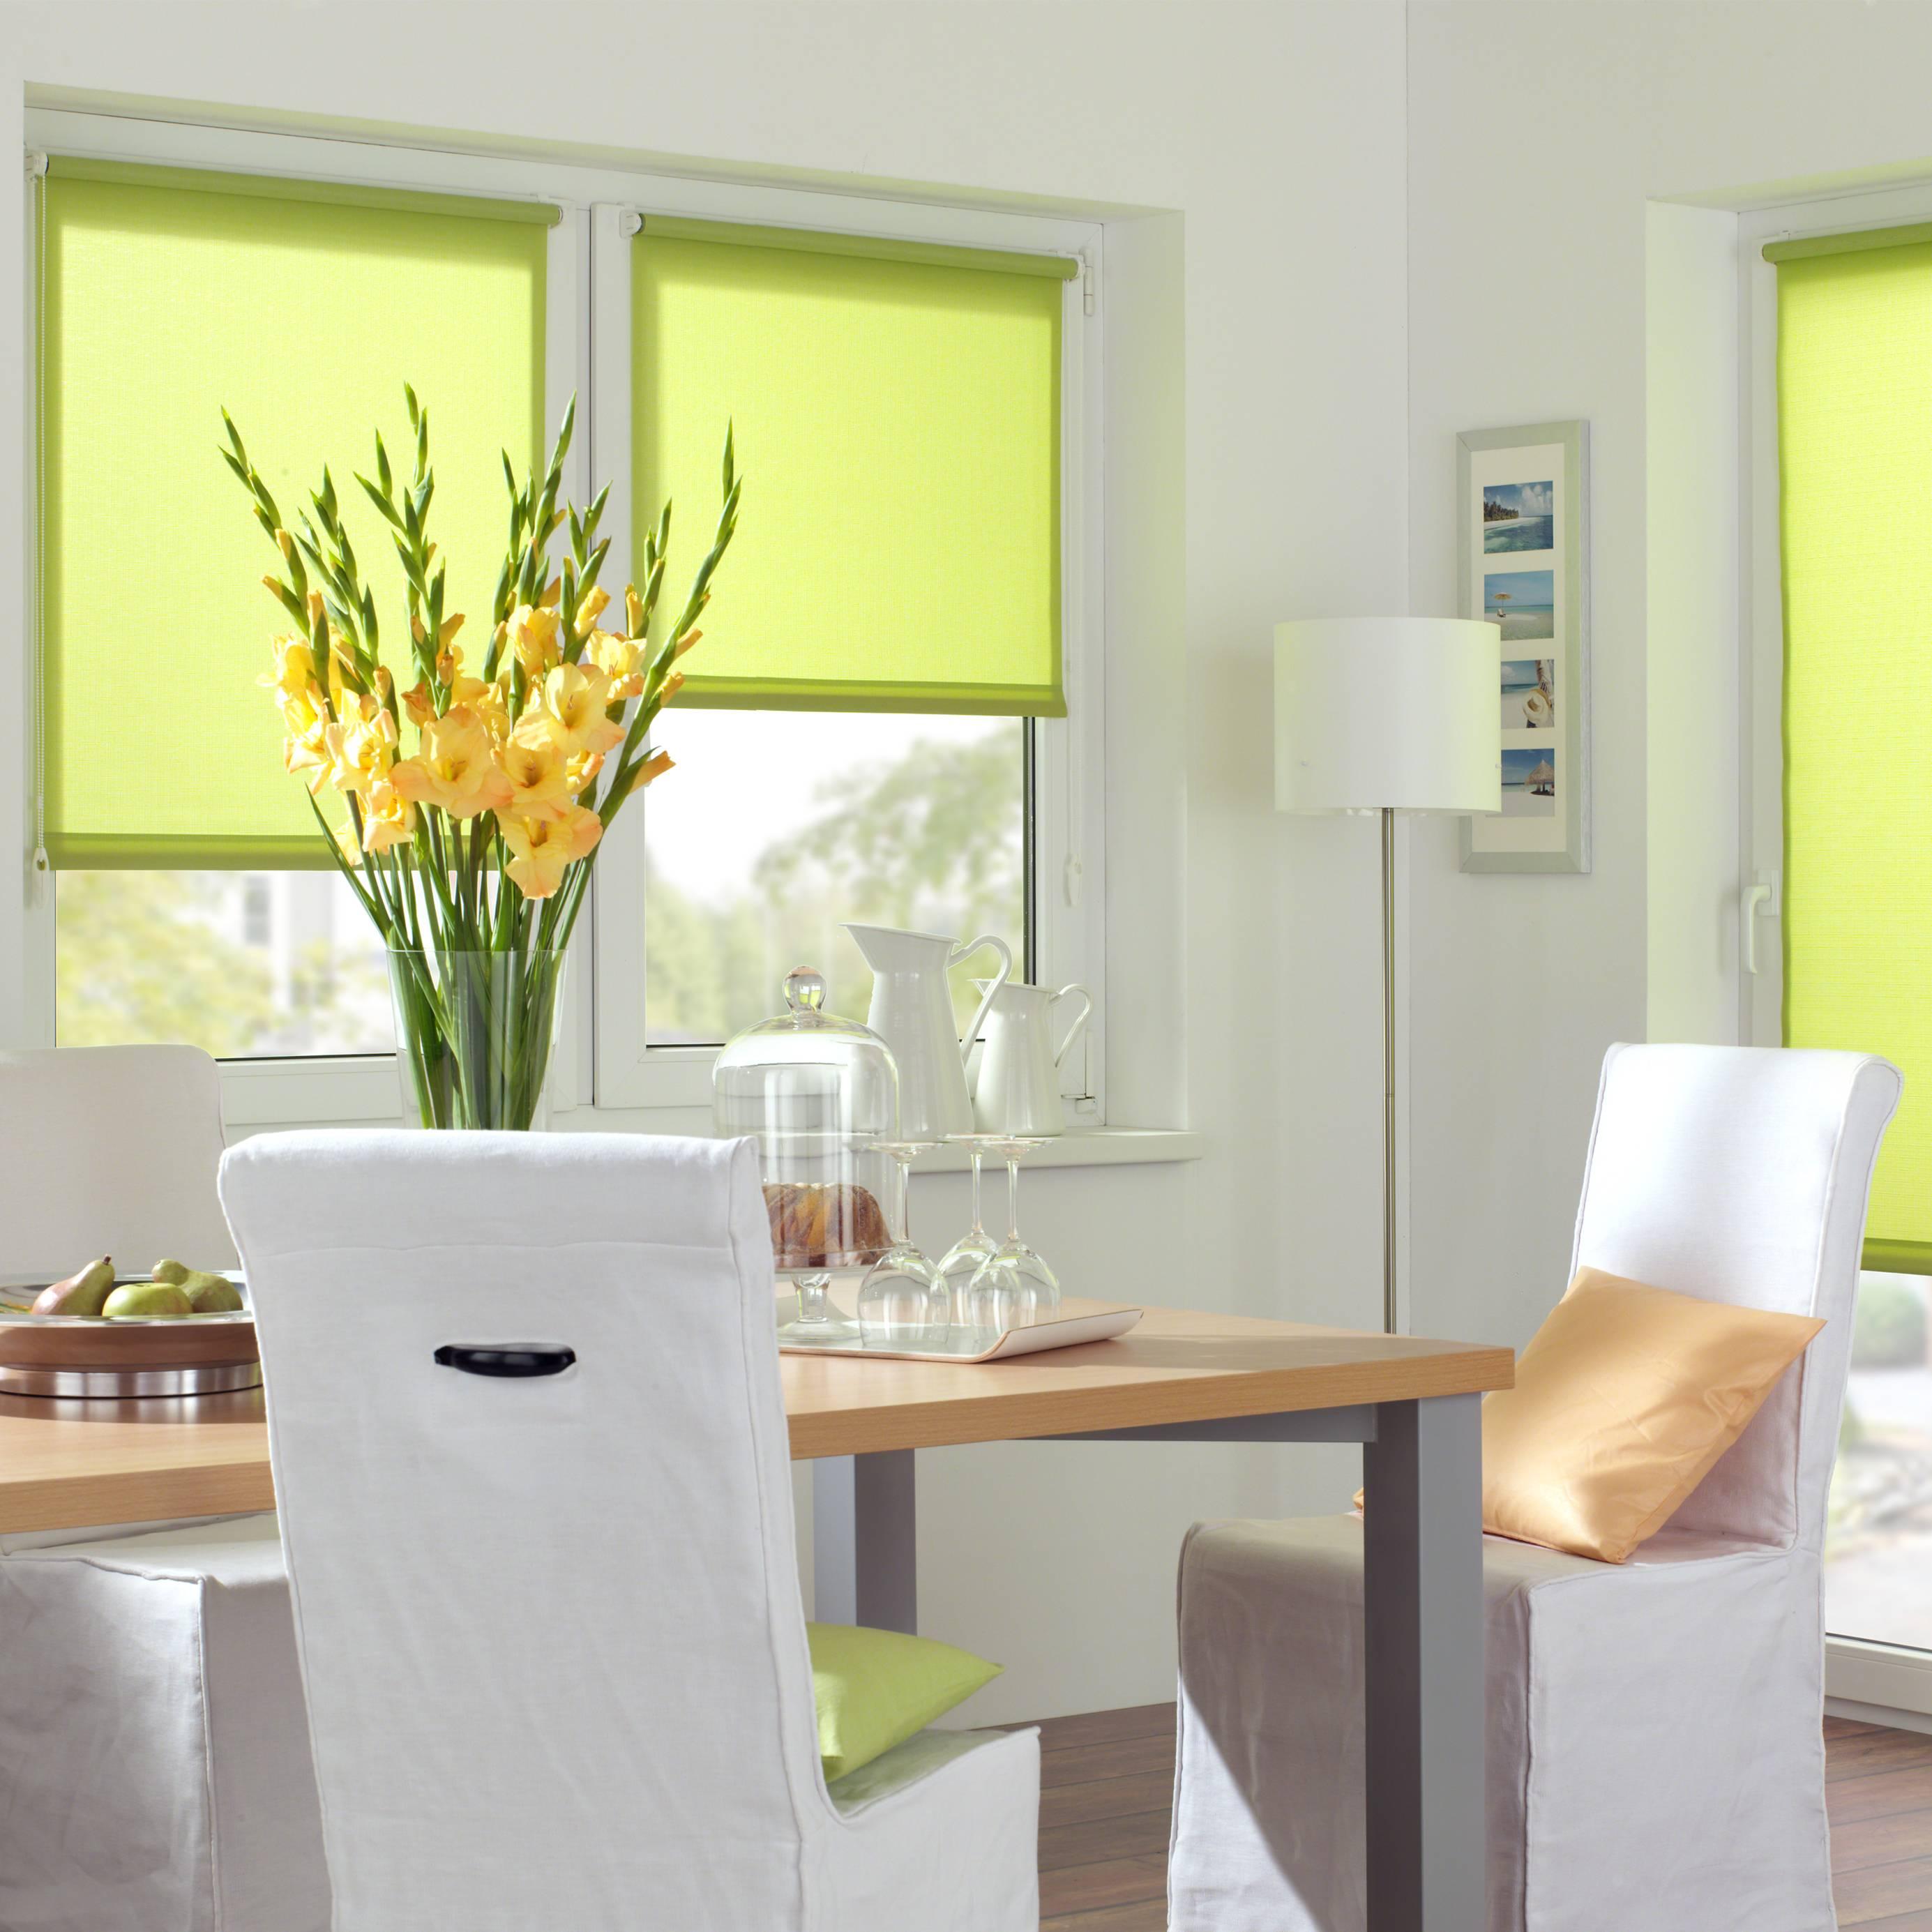 easyfix rollo apfel struktur 90 x 210 cm 31303. Black Bedroom Furniture Sets. Home Design Ideas